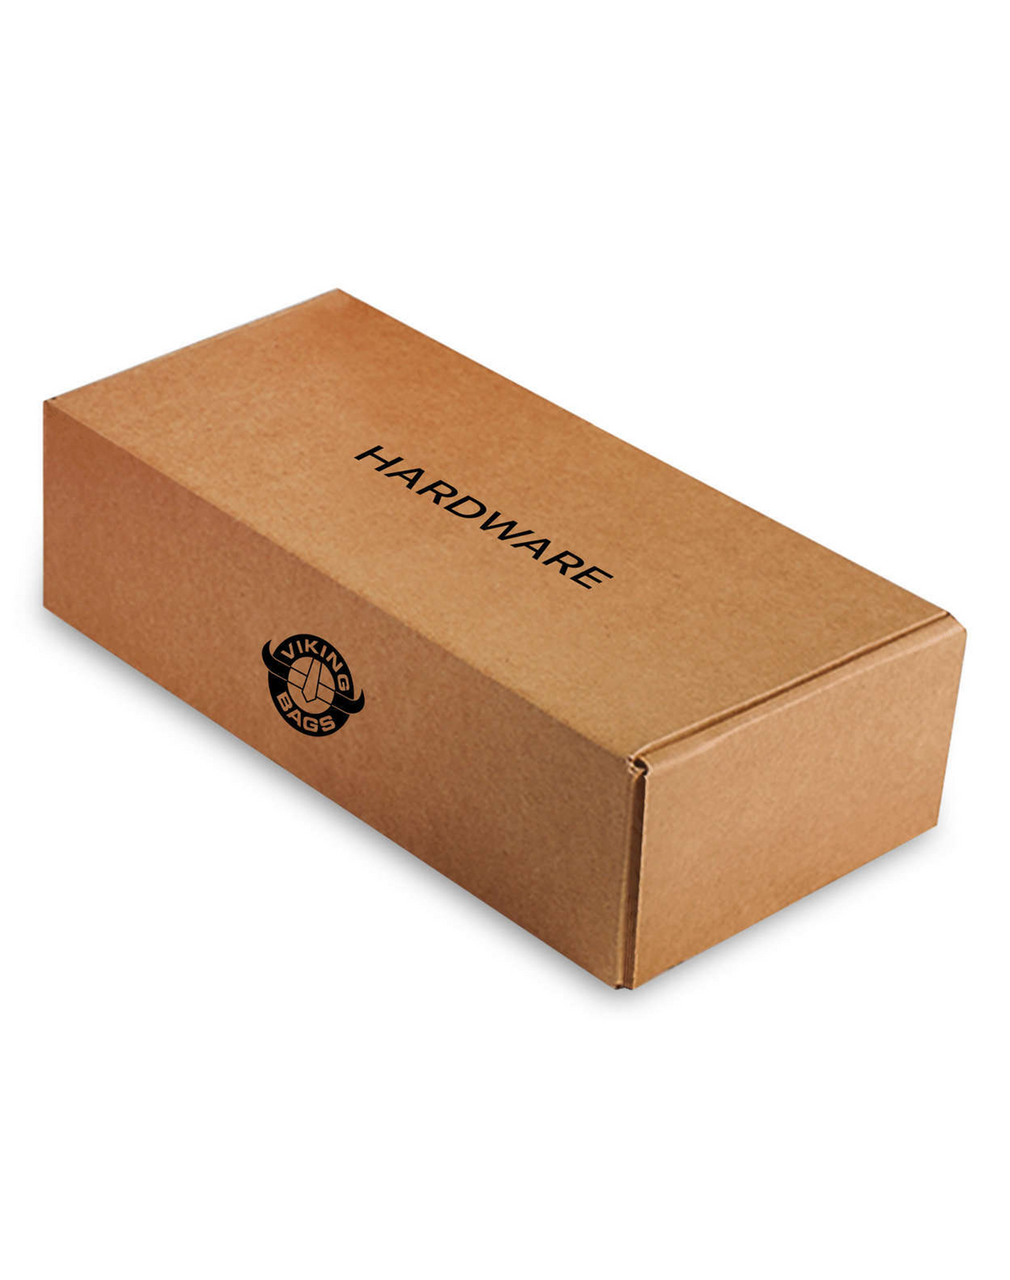 Honda 1500 Valkyrie Interstate Armor Shock Cutout Motorcycle Saddlebags Hardware Box